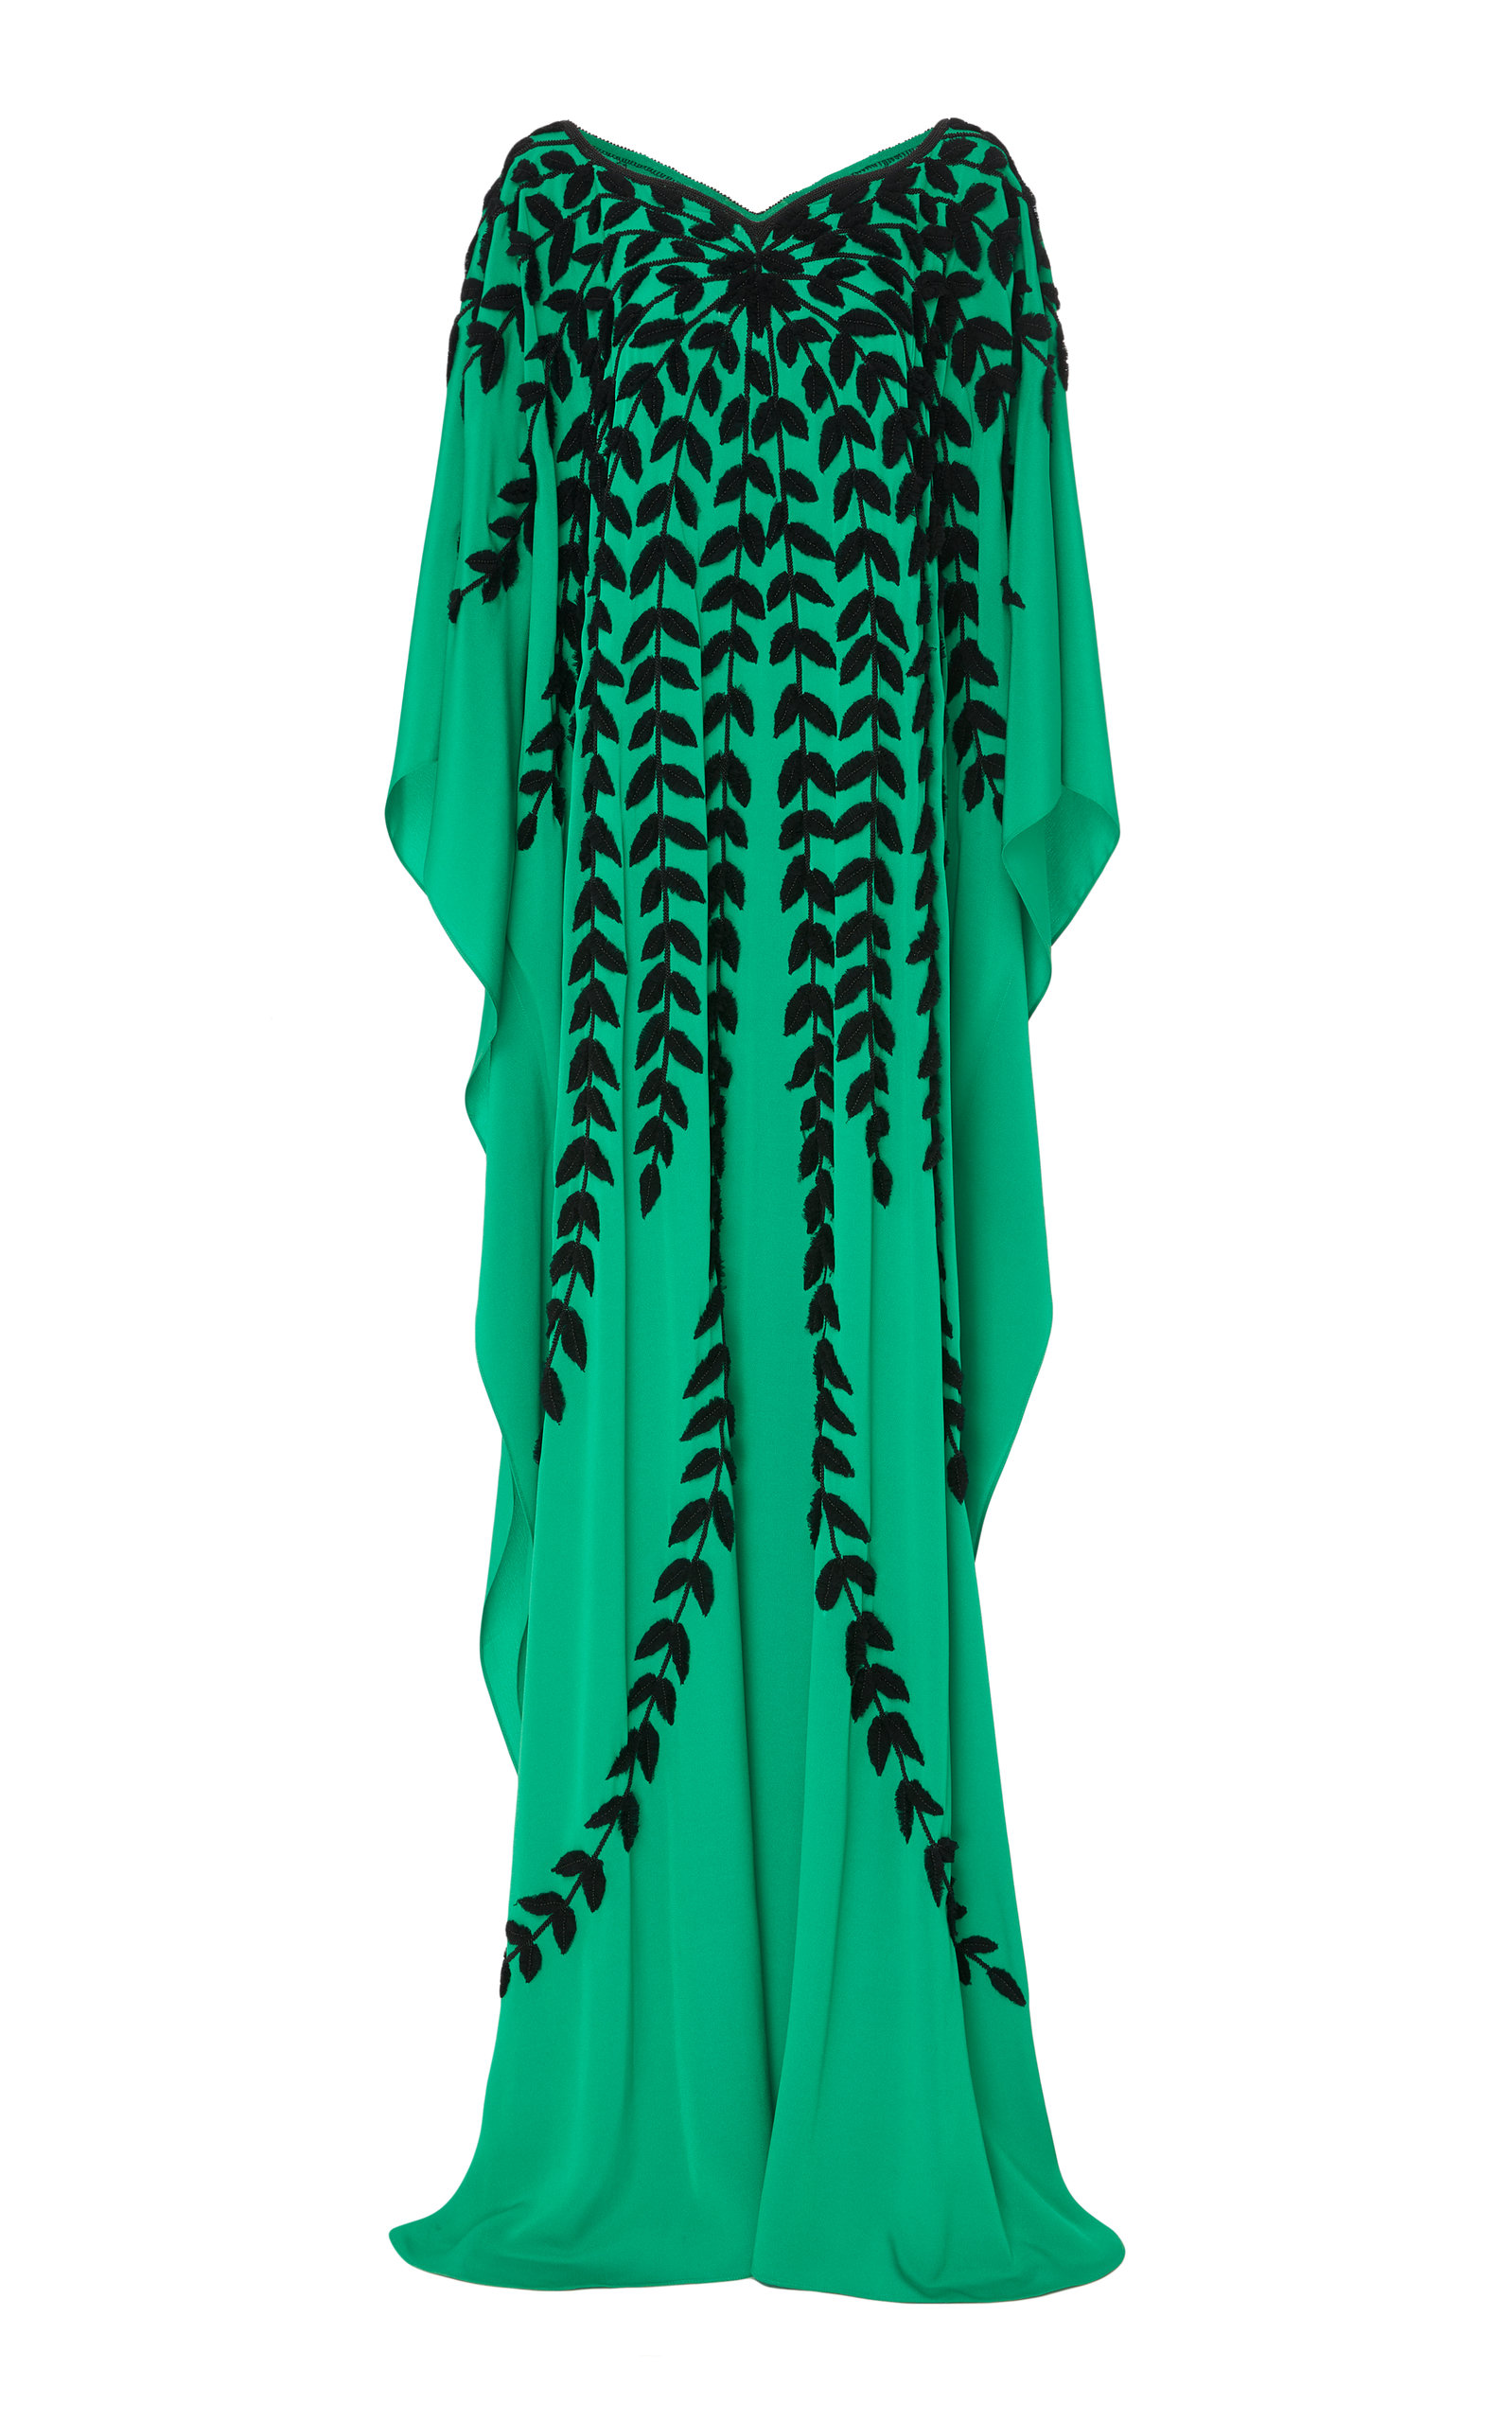 JOANNA MASTROIANNI Embellished Silk Caftan in Green